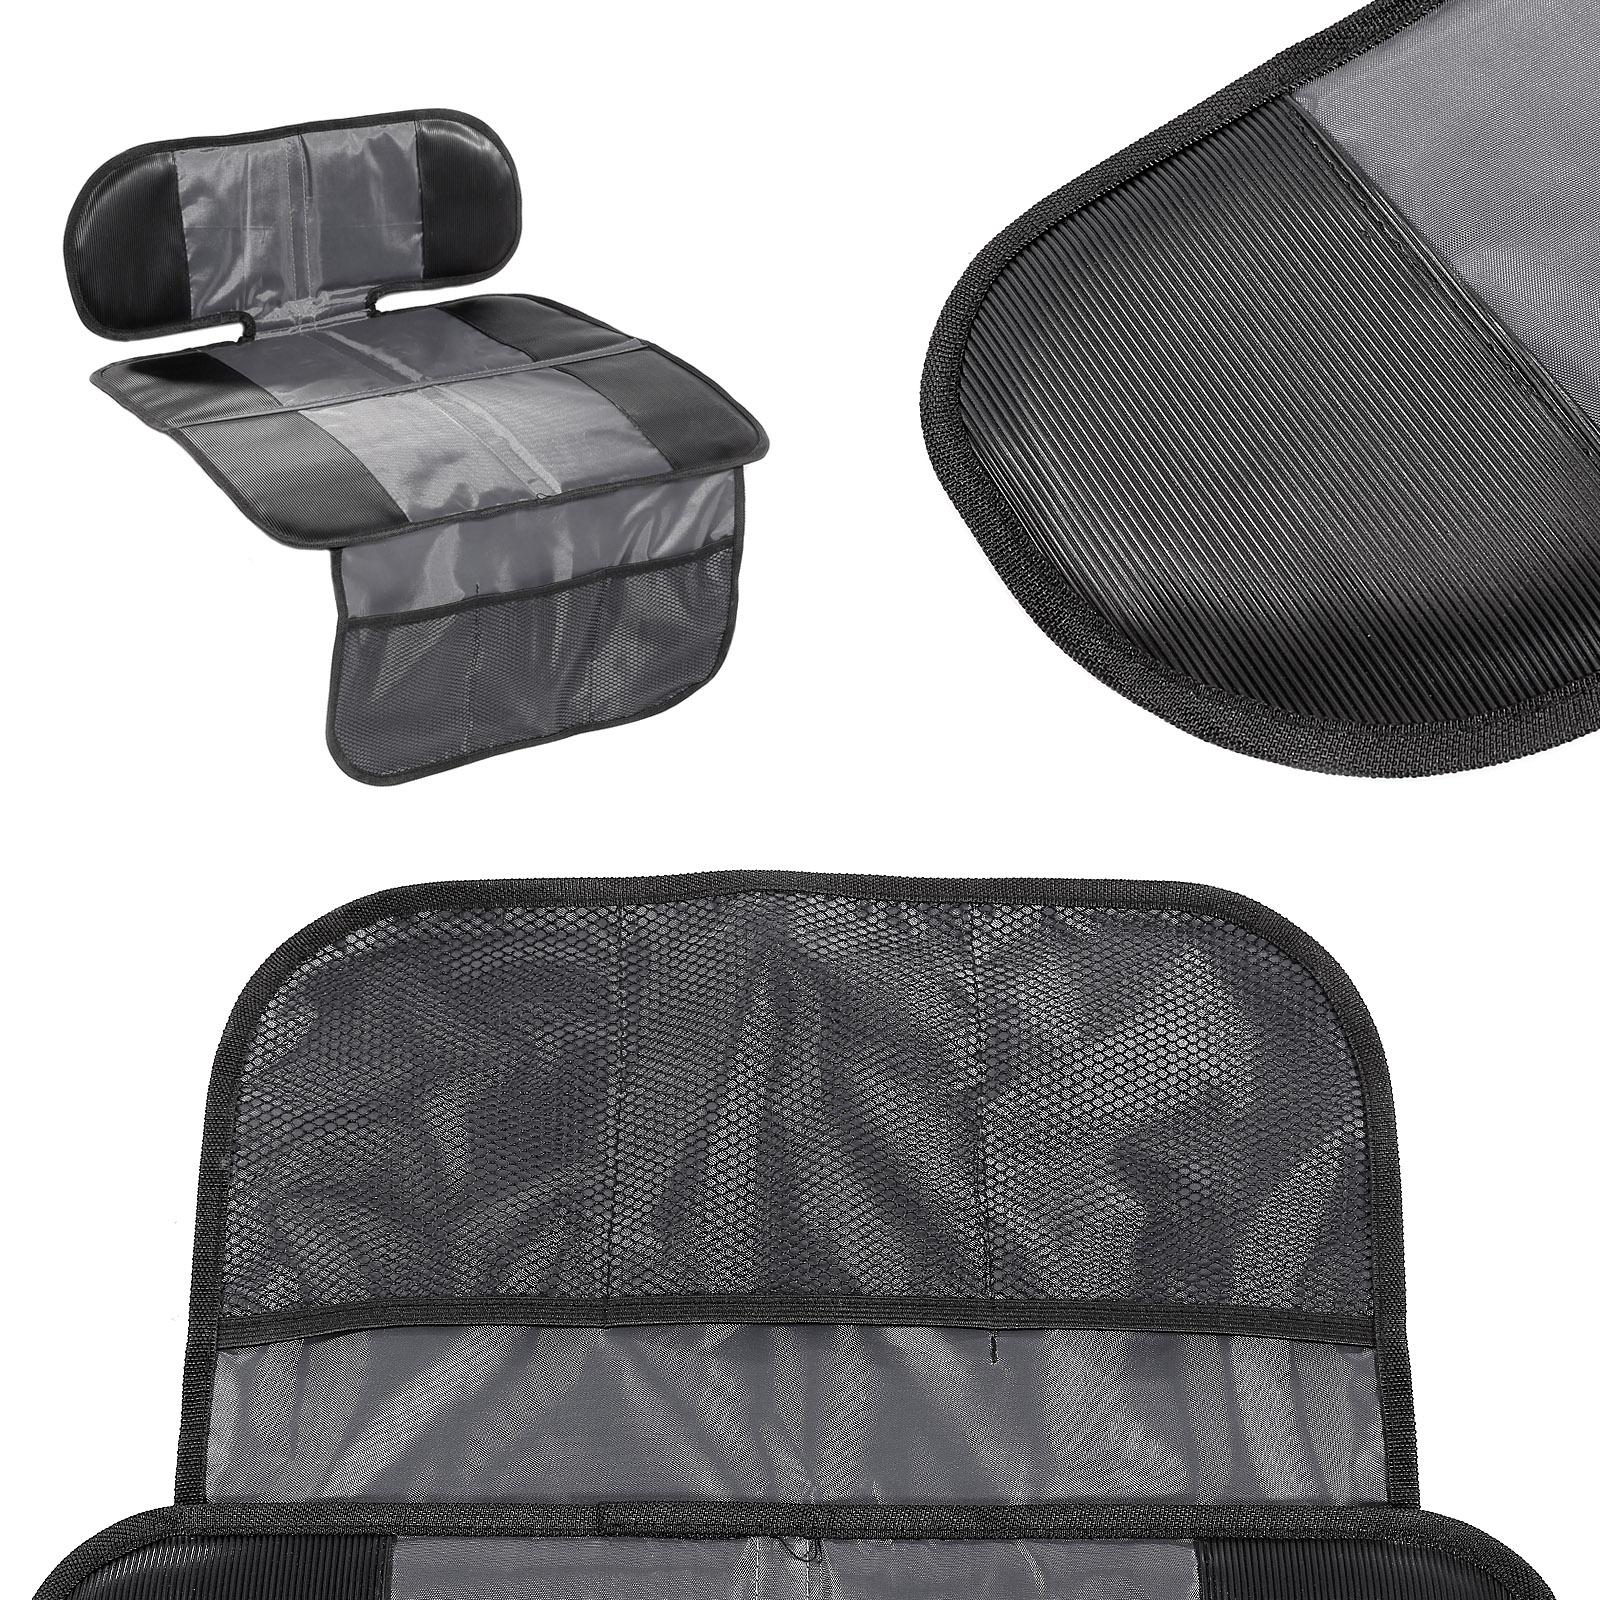 coussin antiderapant couvre si ge voiture protection b b enfant s curit tapis ebay. Black Bedroom Furniture Sets. Home Design Ideas